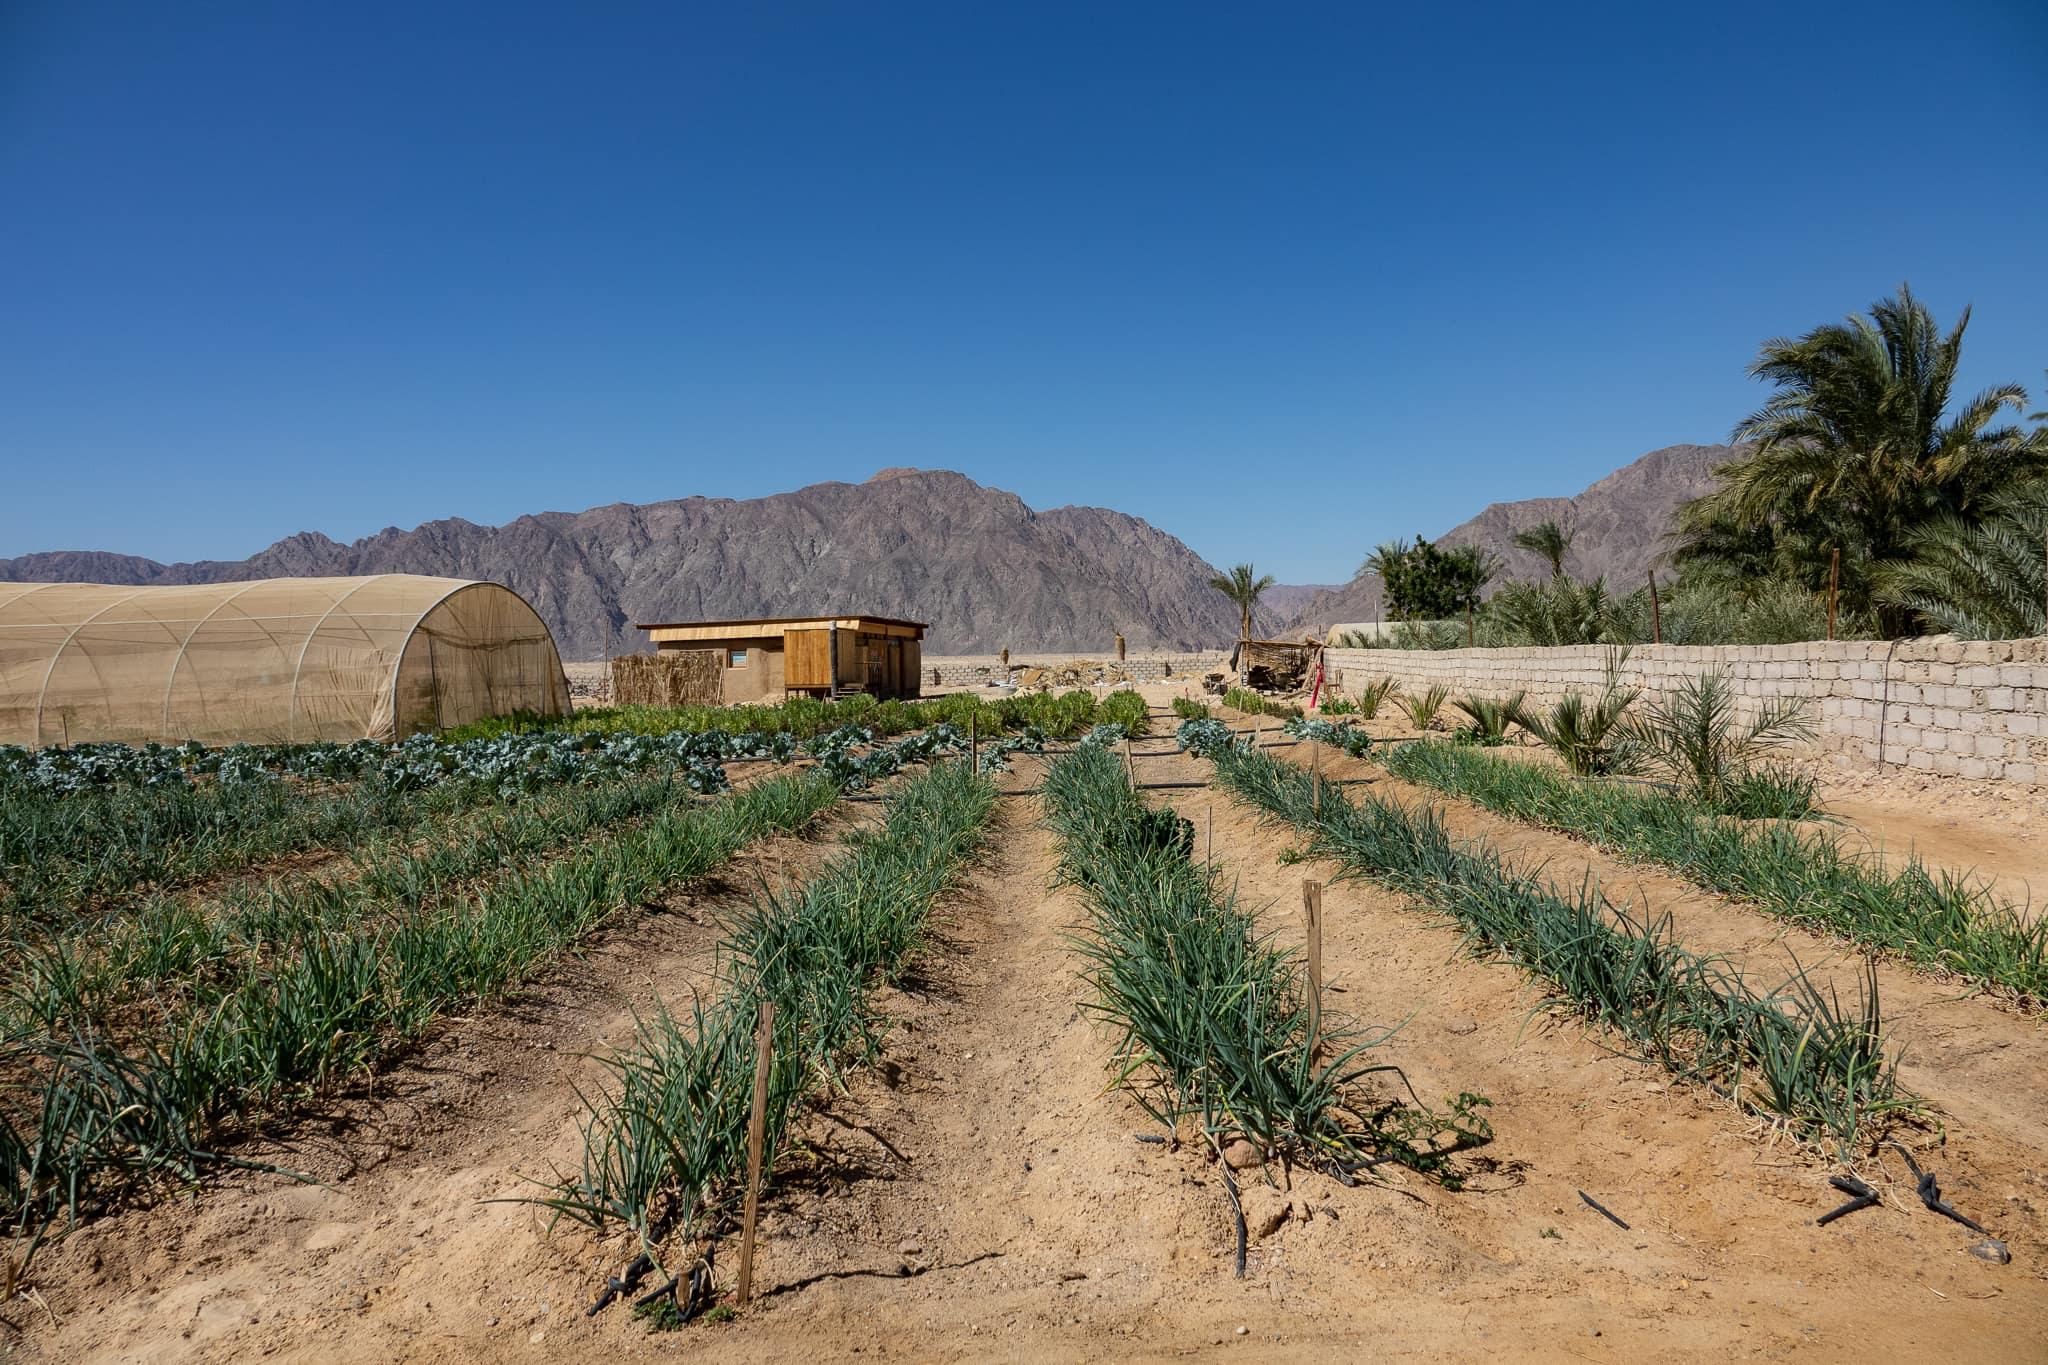 Habiba farm